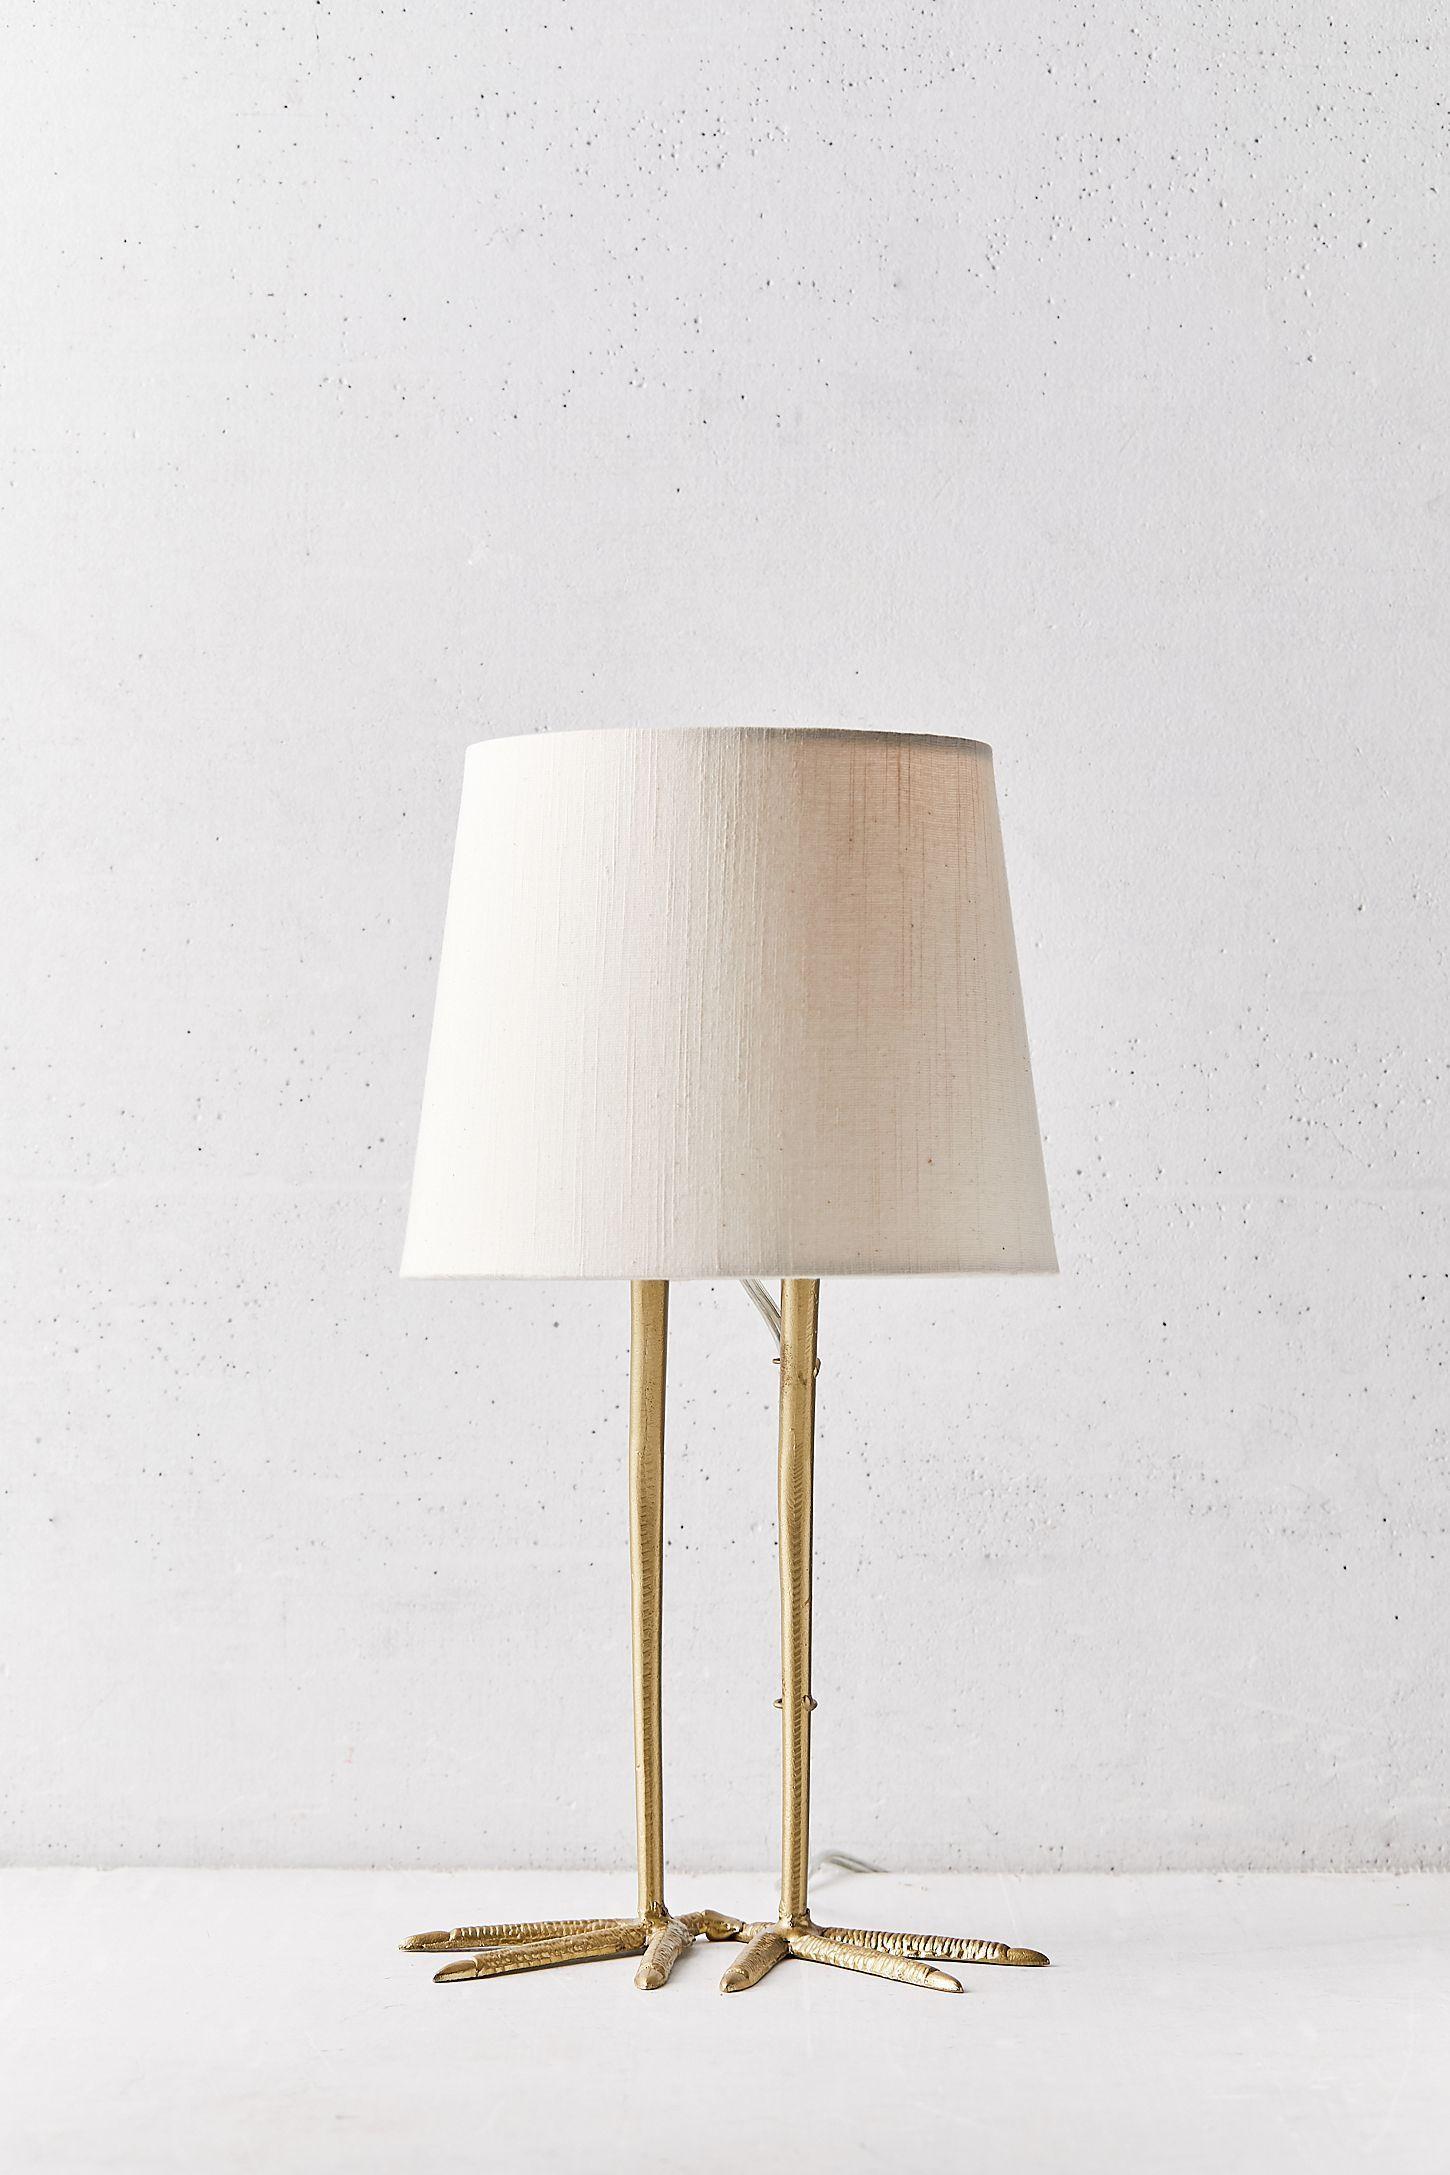 Slide View 4 Birdy Metal Table Lamp Homedecorideaspaint Lampentisch Moderne Lampen Industrie Stil Lampen